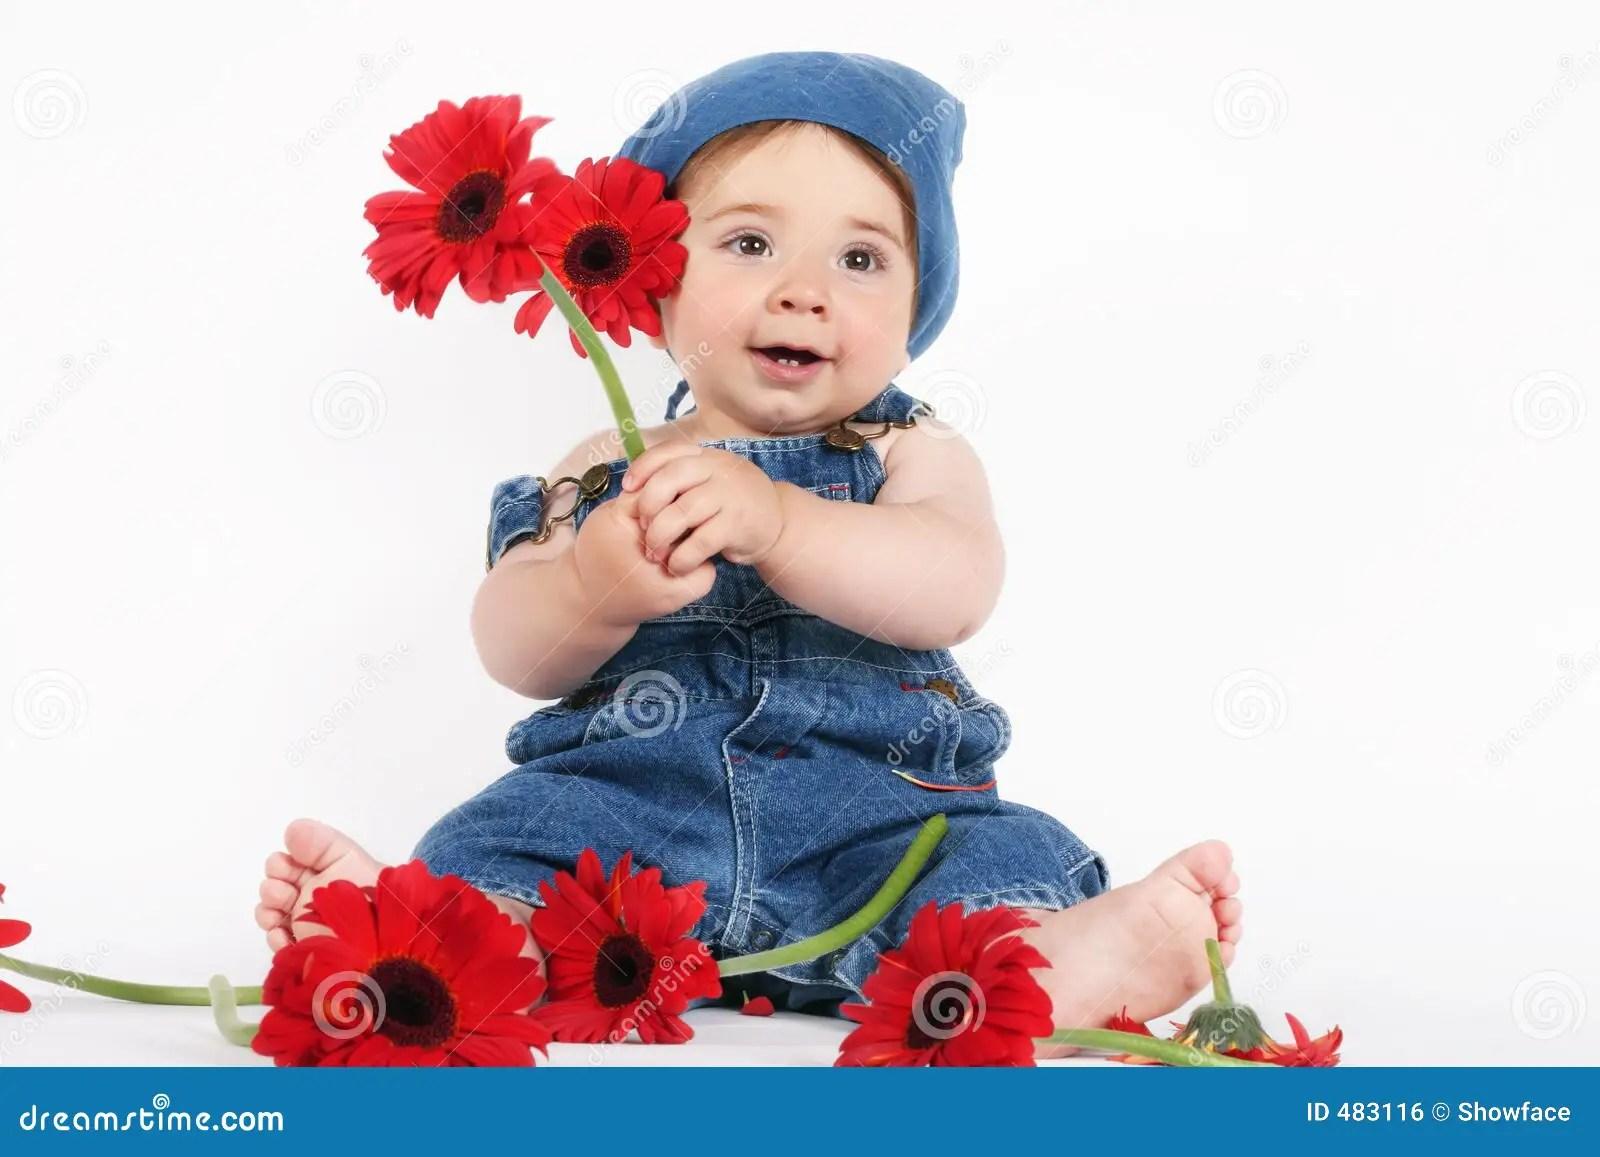 Spring Baby Royalty Free Stock Image Image 483116